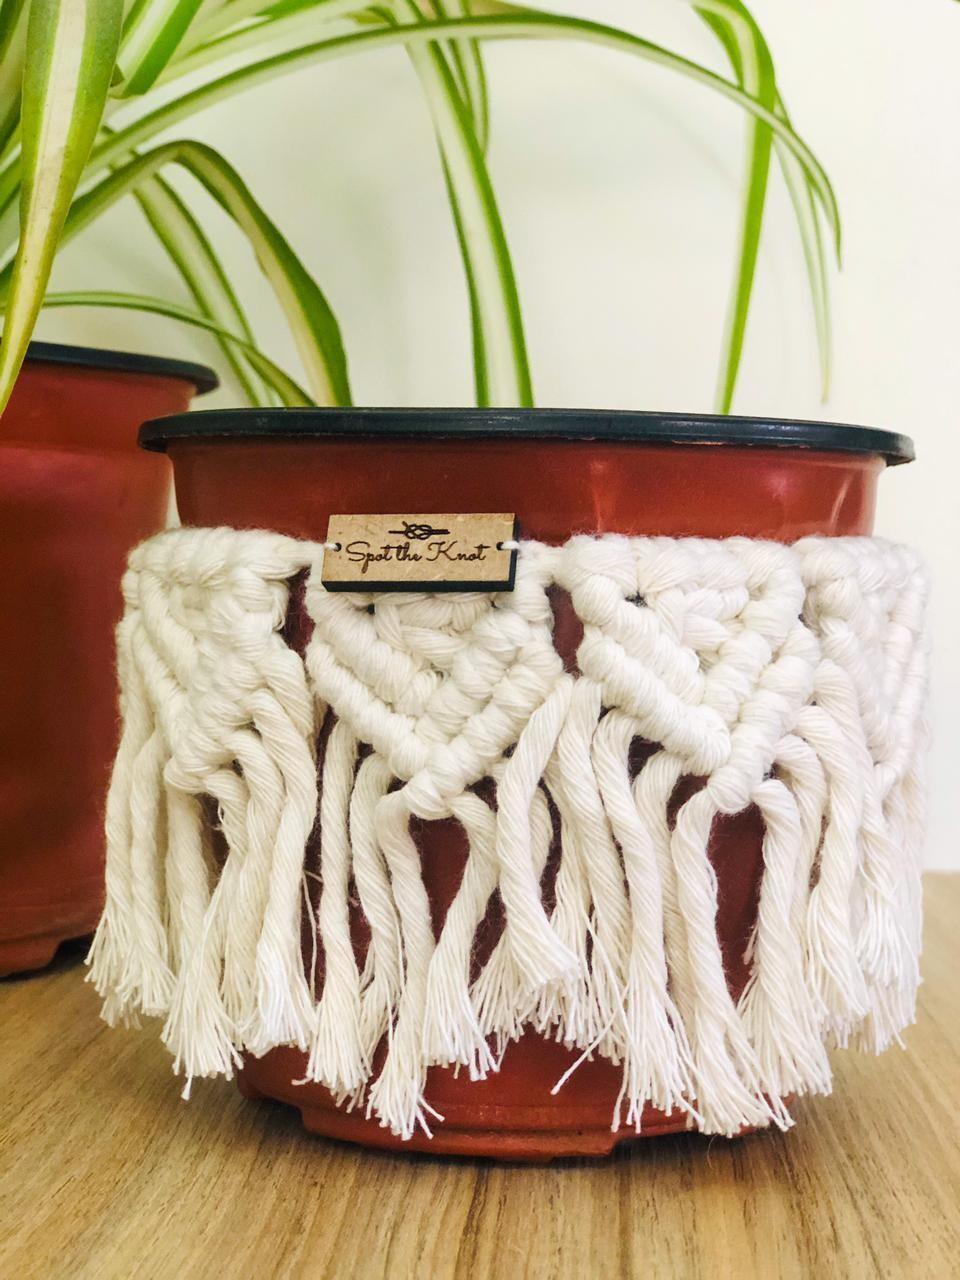 Macrame Cover Pot White (Piece) - Spot the Knot